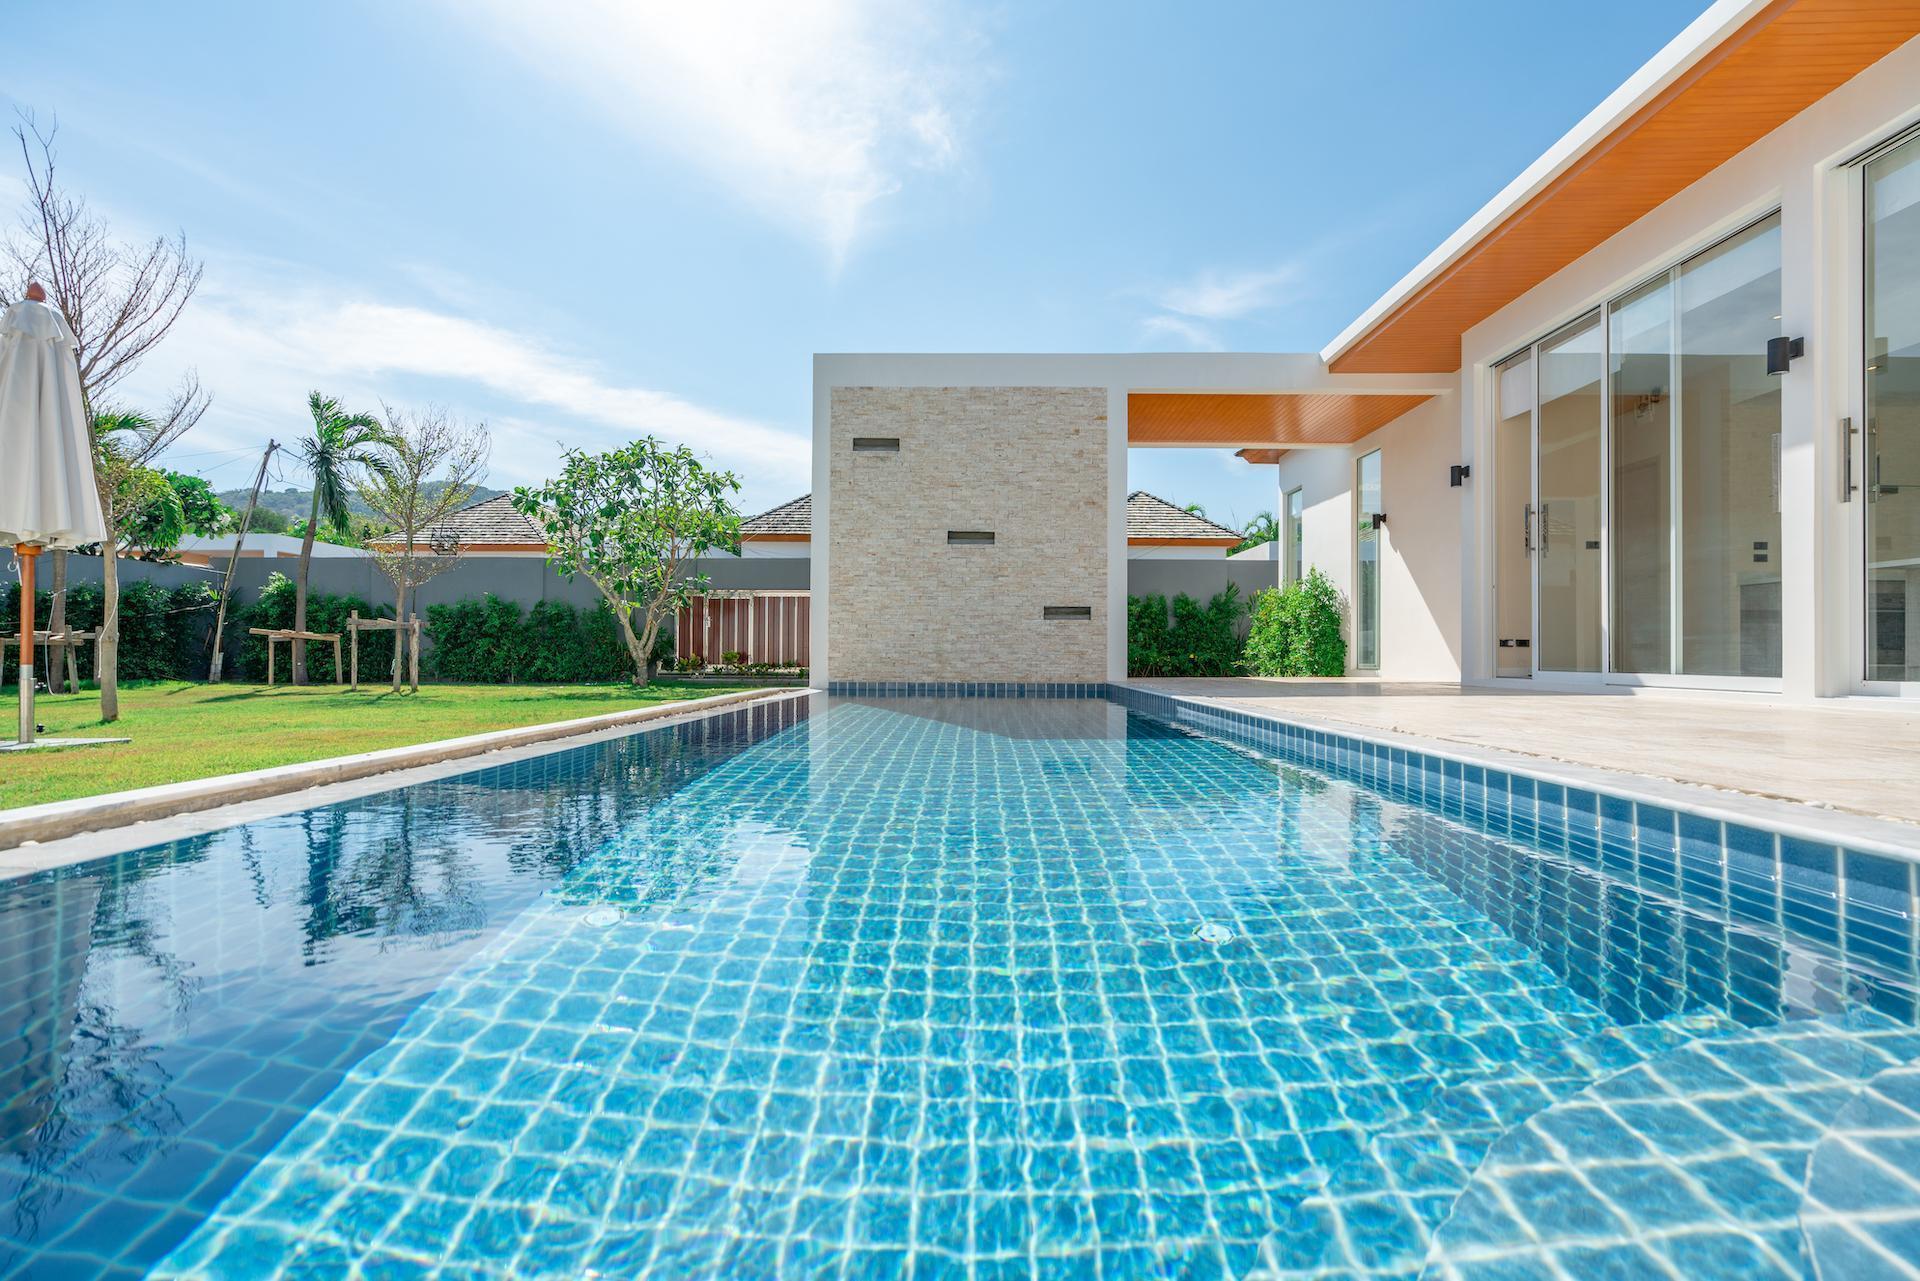 Signature Pool Villa near Beach 4 Bedrooms วิลลา 4 ห้องนอน 4 ห้องน้ำส่วนตัว ขนาด 200 ตร.ม. – ในหาน